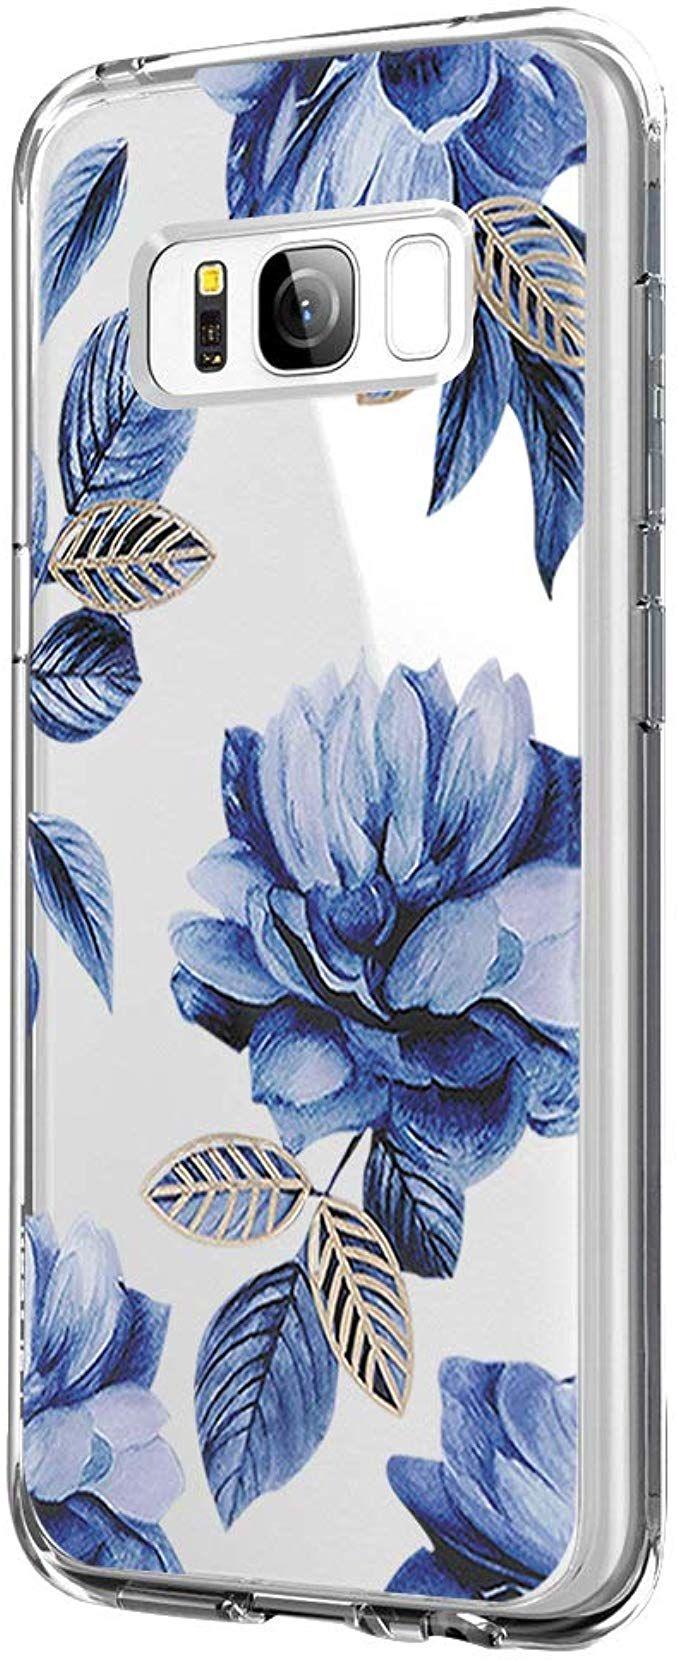 Coque Samsung Galaxy S8 Étui Silicone Flexible Transparent Motif ...